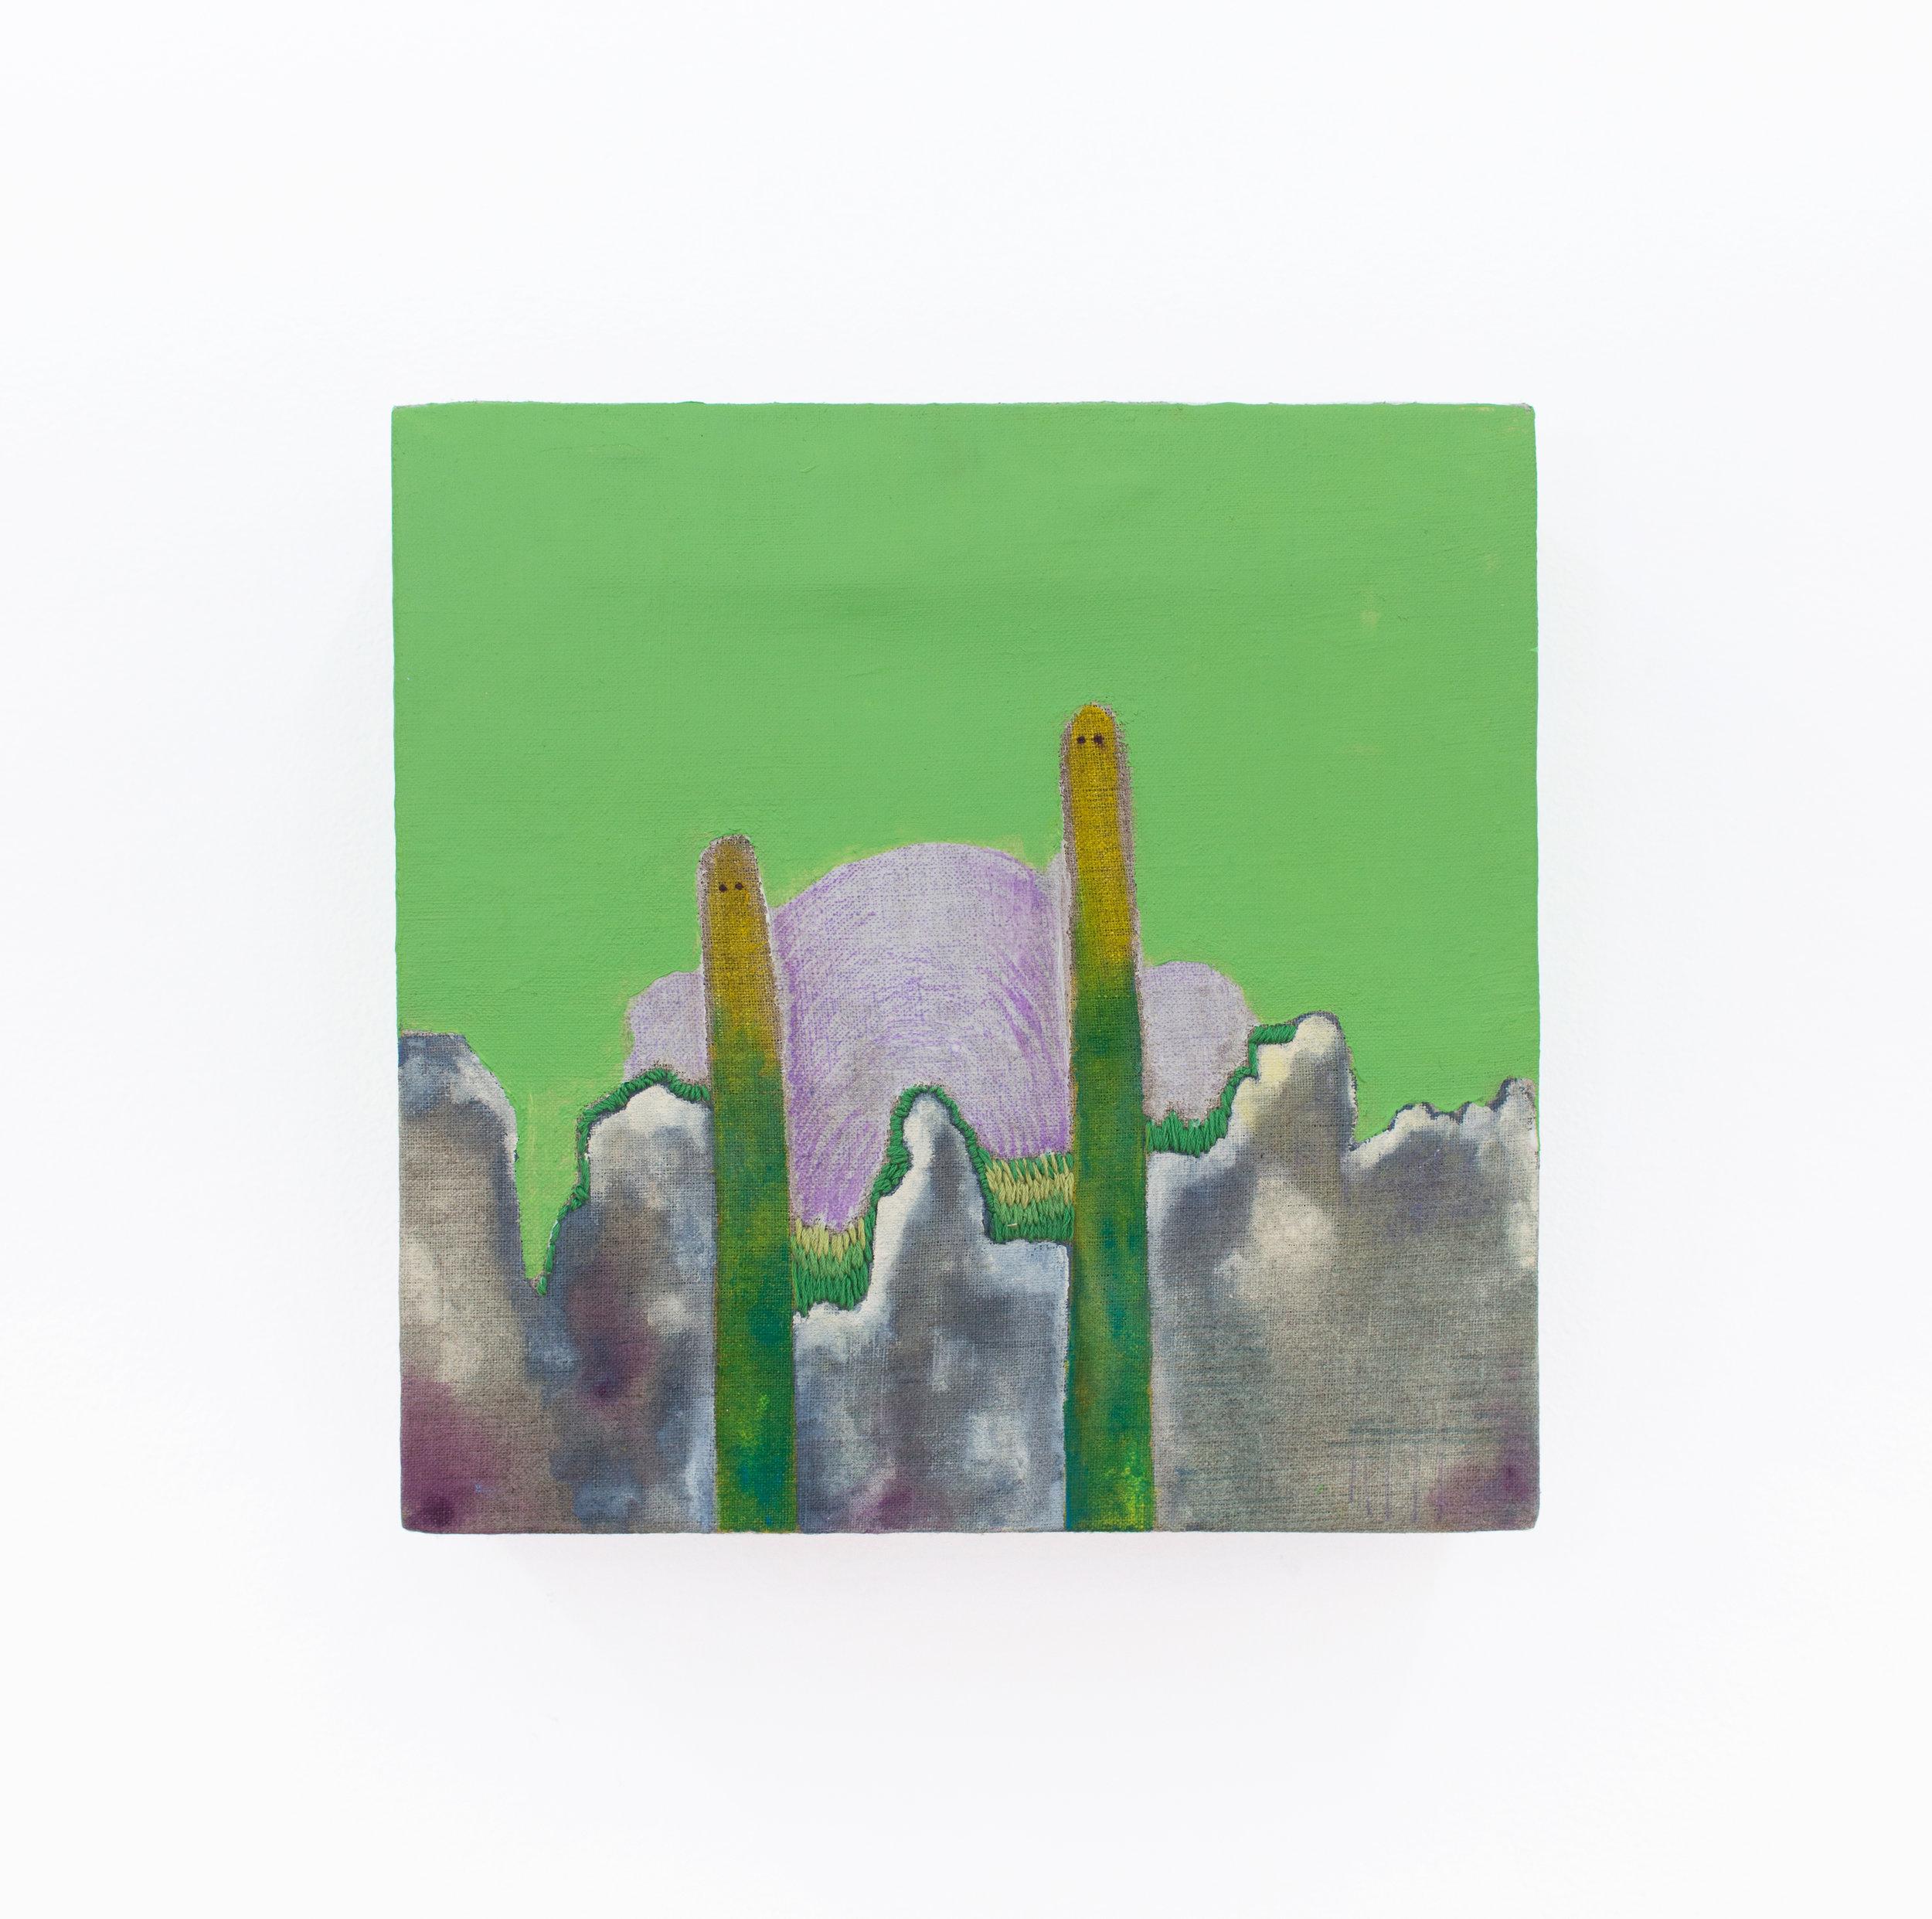 Sofia Ortiz   Cactus,  2017 Acrylic, pencil, gouache, thread on linen 12 x 12 x 4 inches